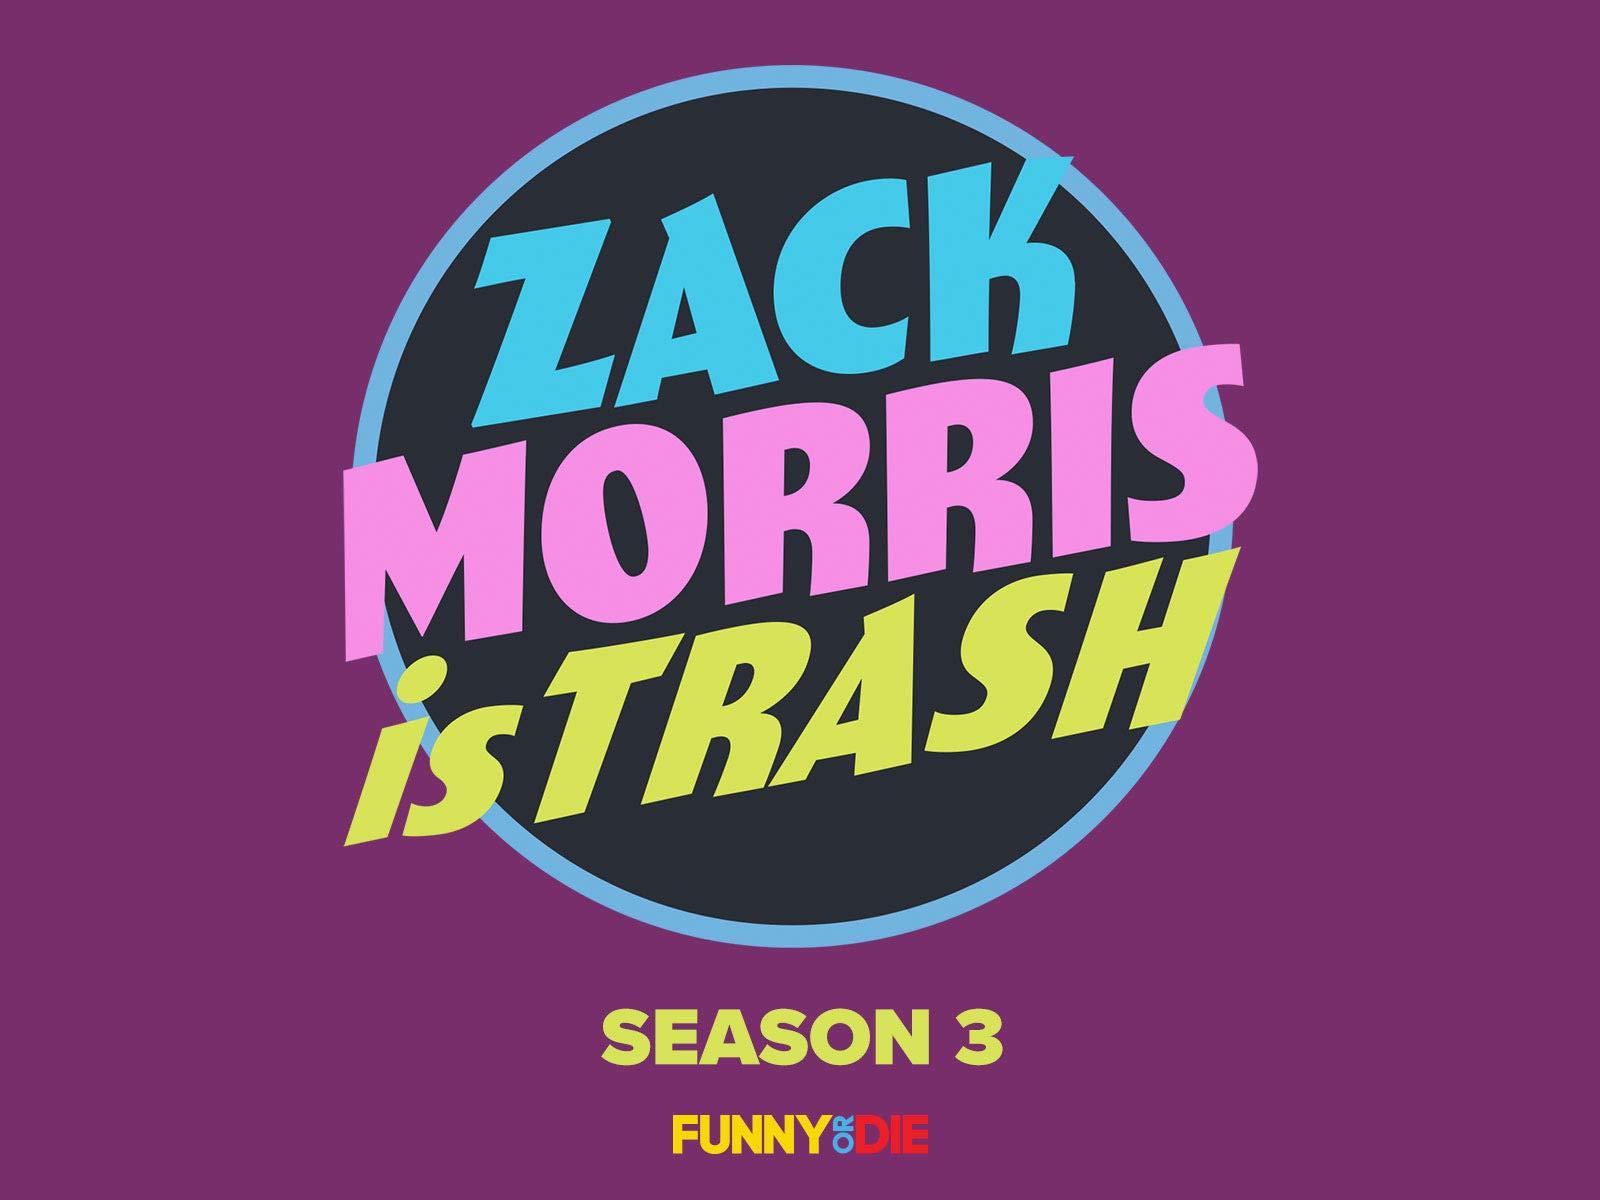 Zack Morris Is Trash - Season 3